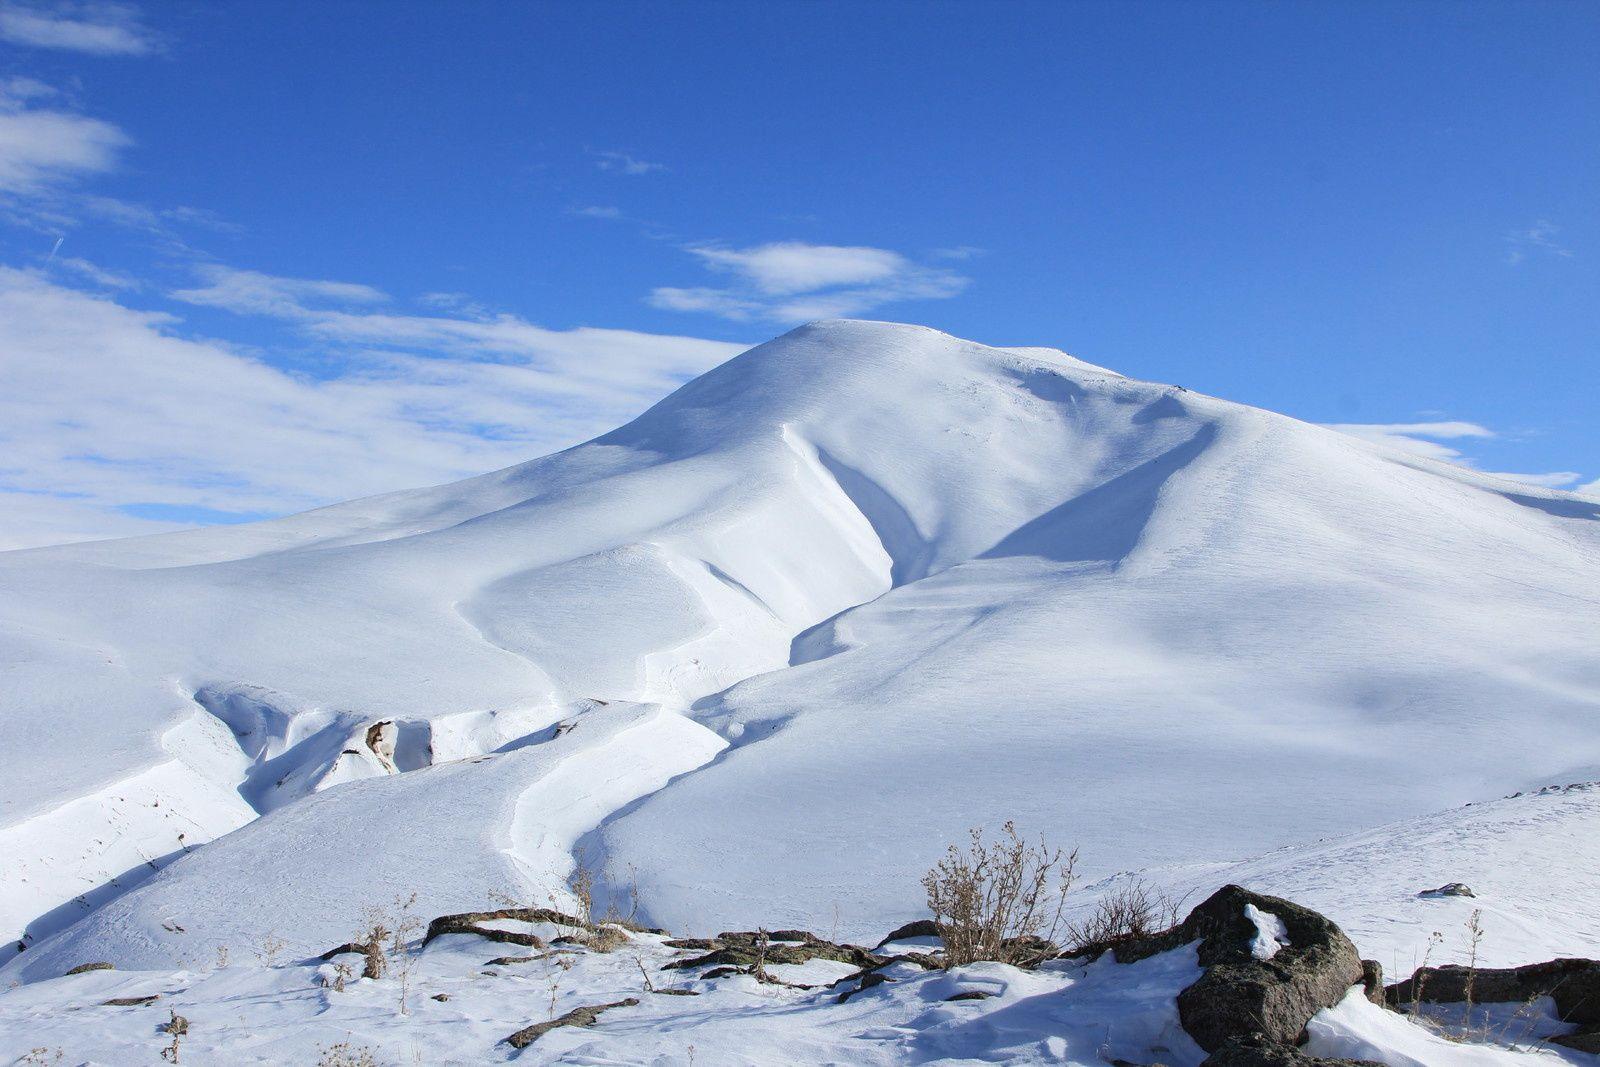 ARMENIE 21/28 février 2020 ski de randonnée & YOGA